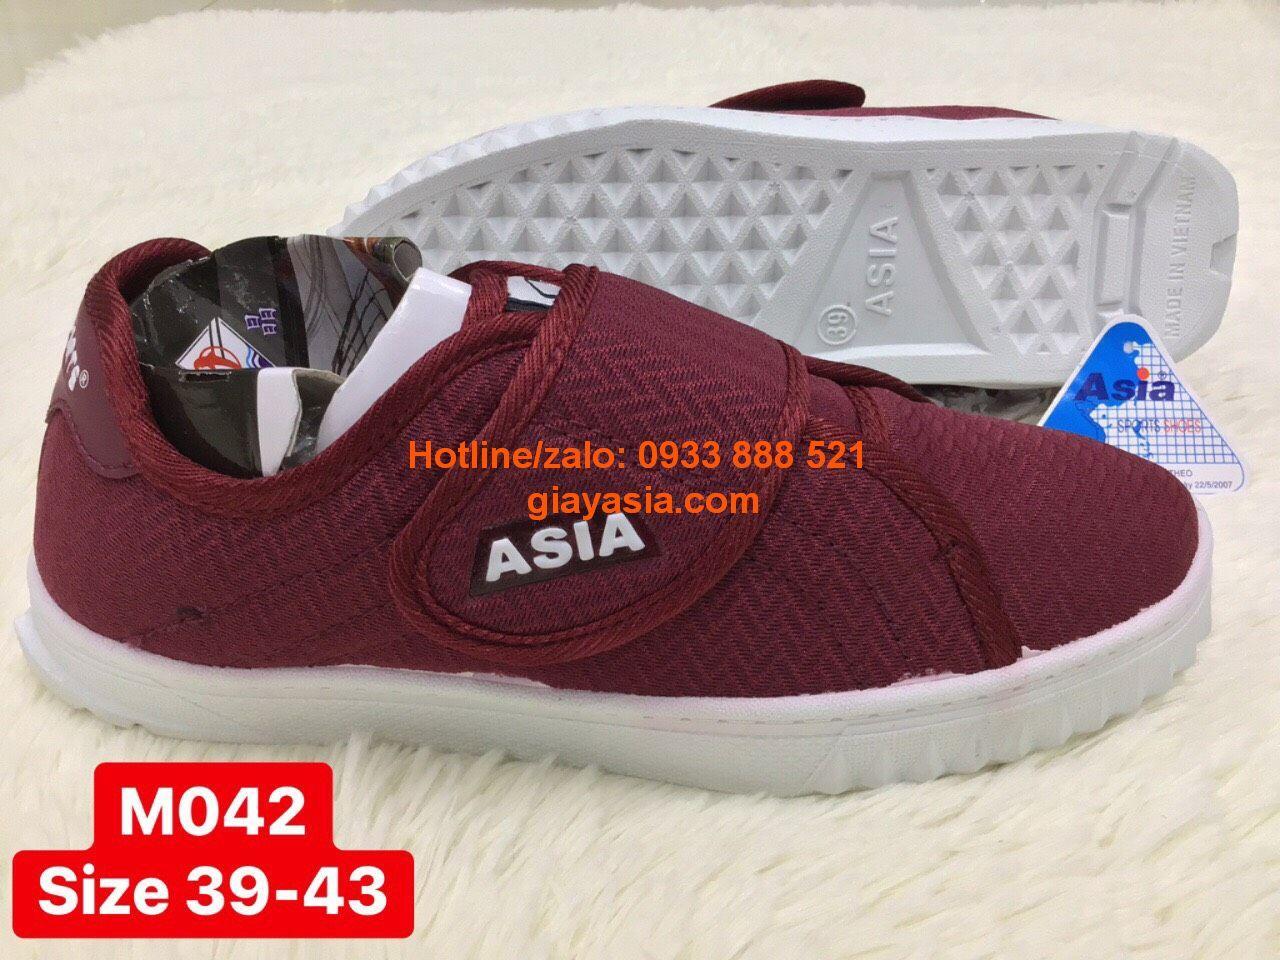 Giày asia quai dán 3 màu